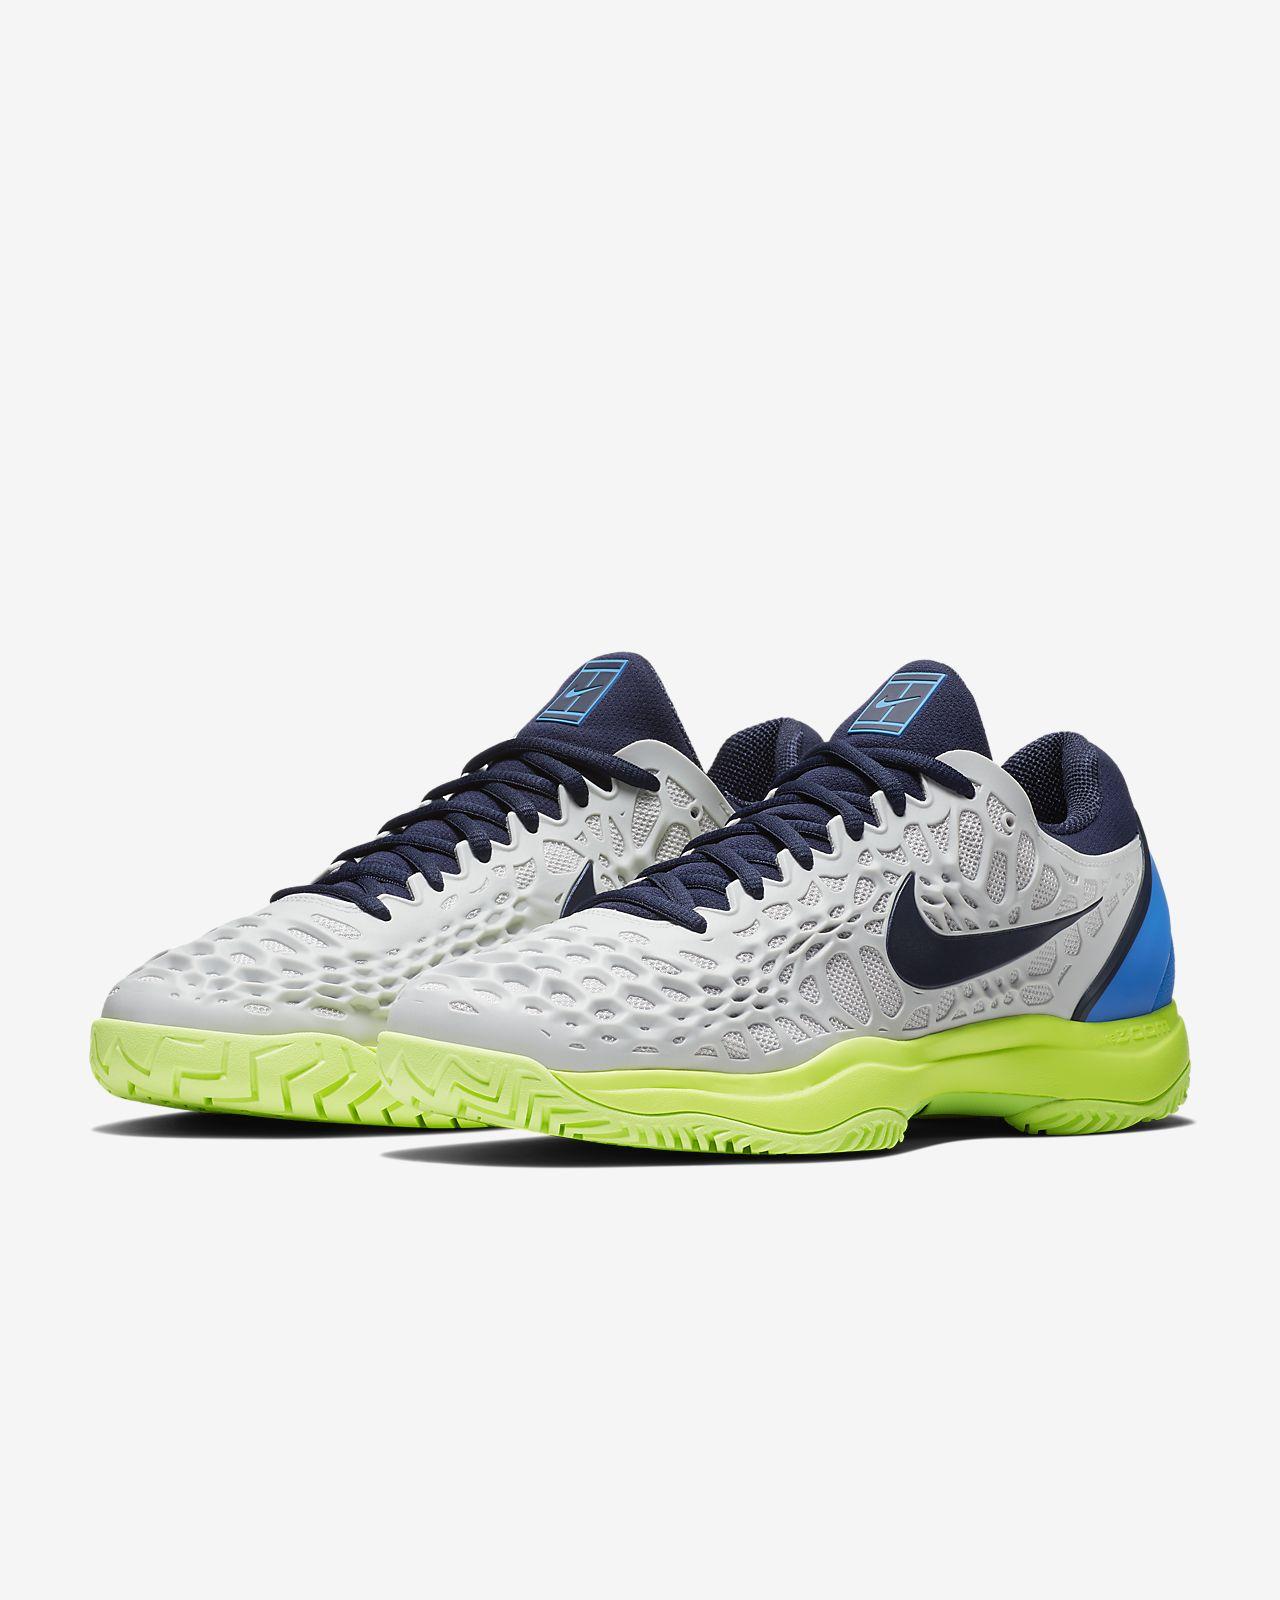 38aae2653b73 NikeCourt Zoom Cage 3 Men s Hard Court Tennis Shoe. Nike.com AU